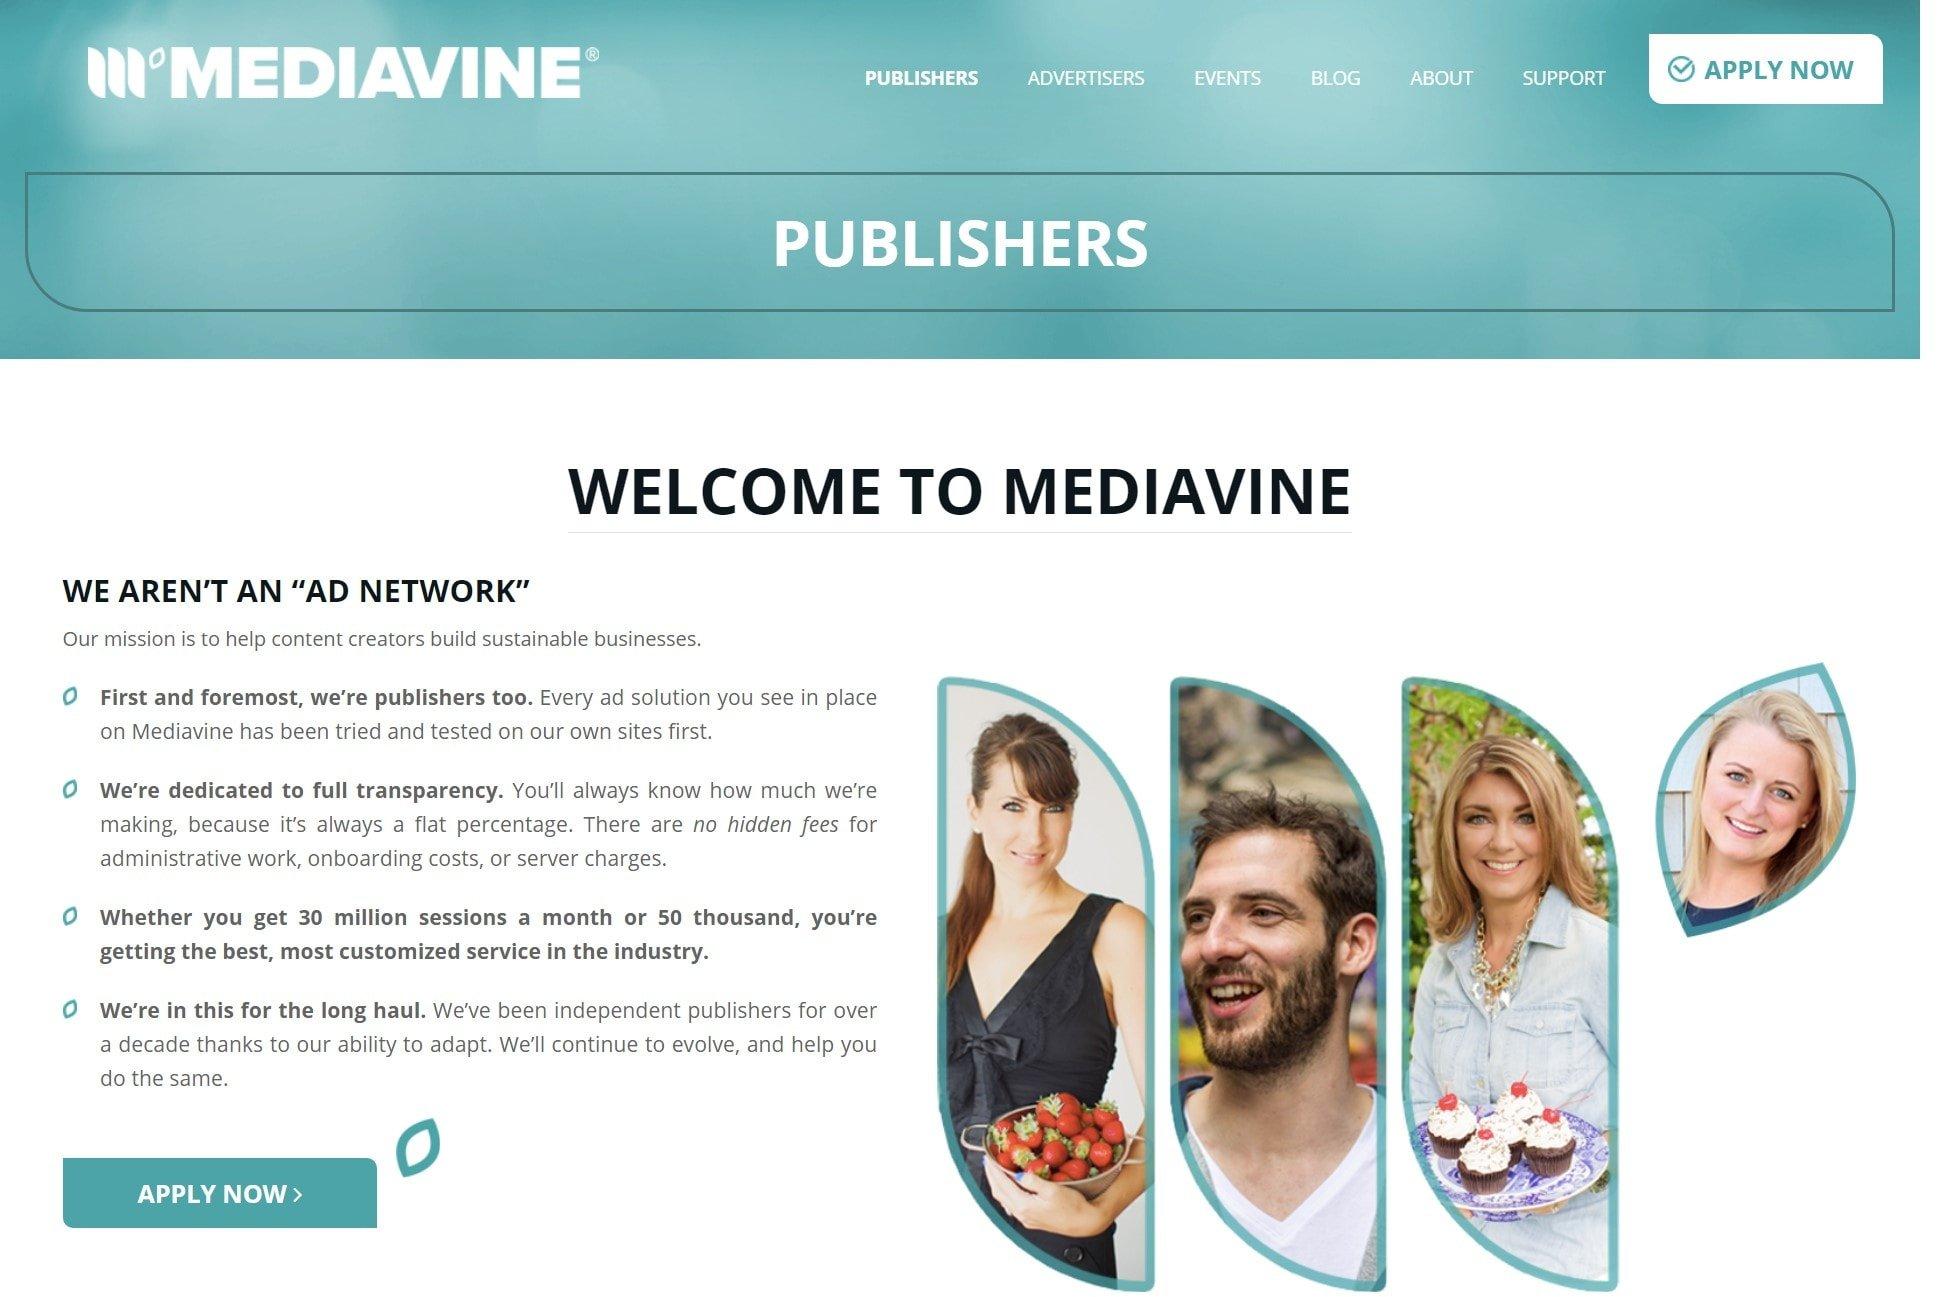 Screengrab from Mediavine's website: 'Welcome to Mediavine' page